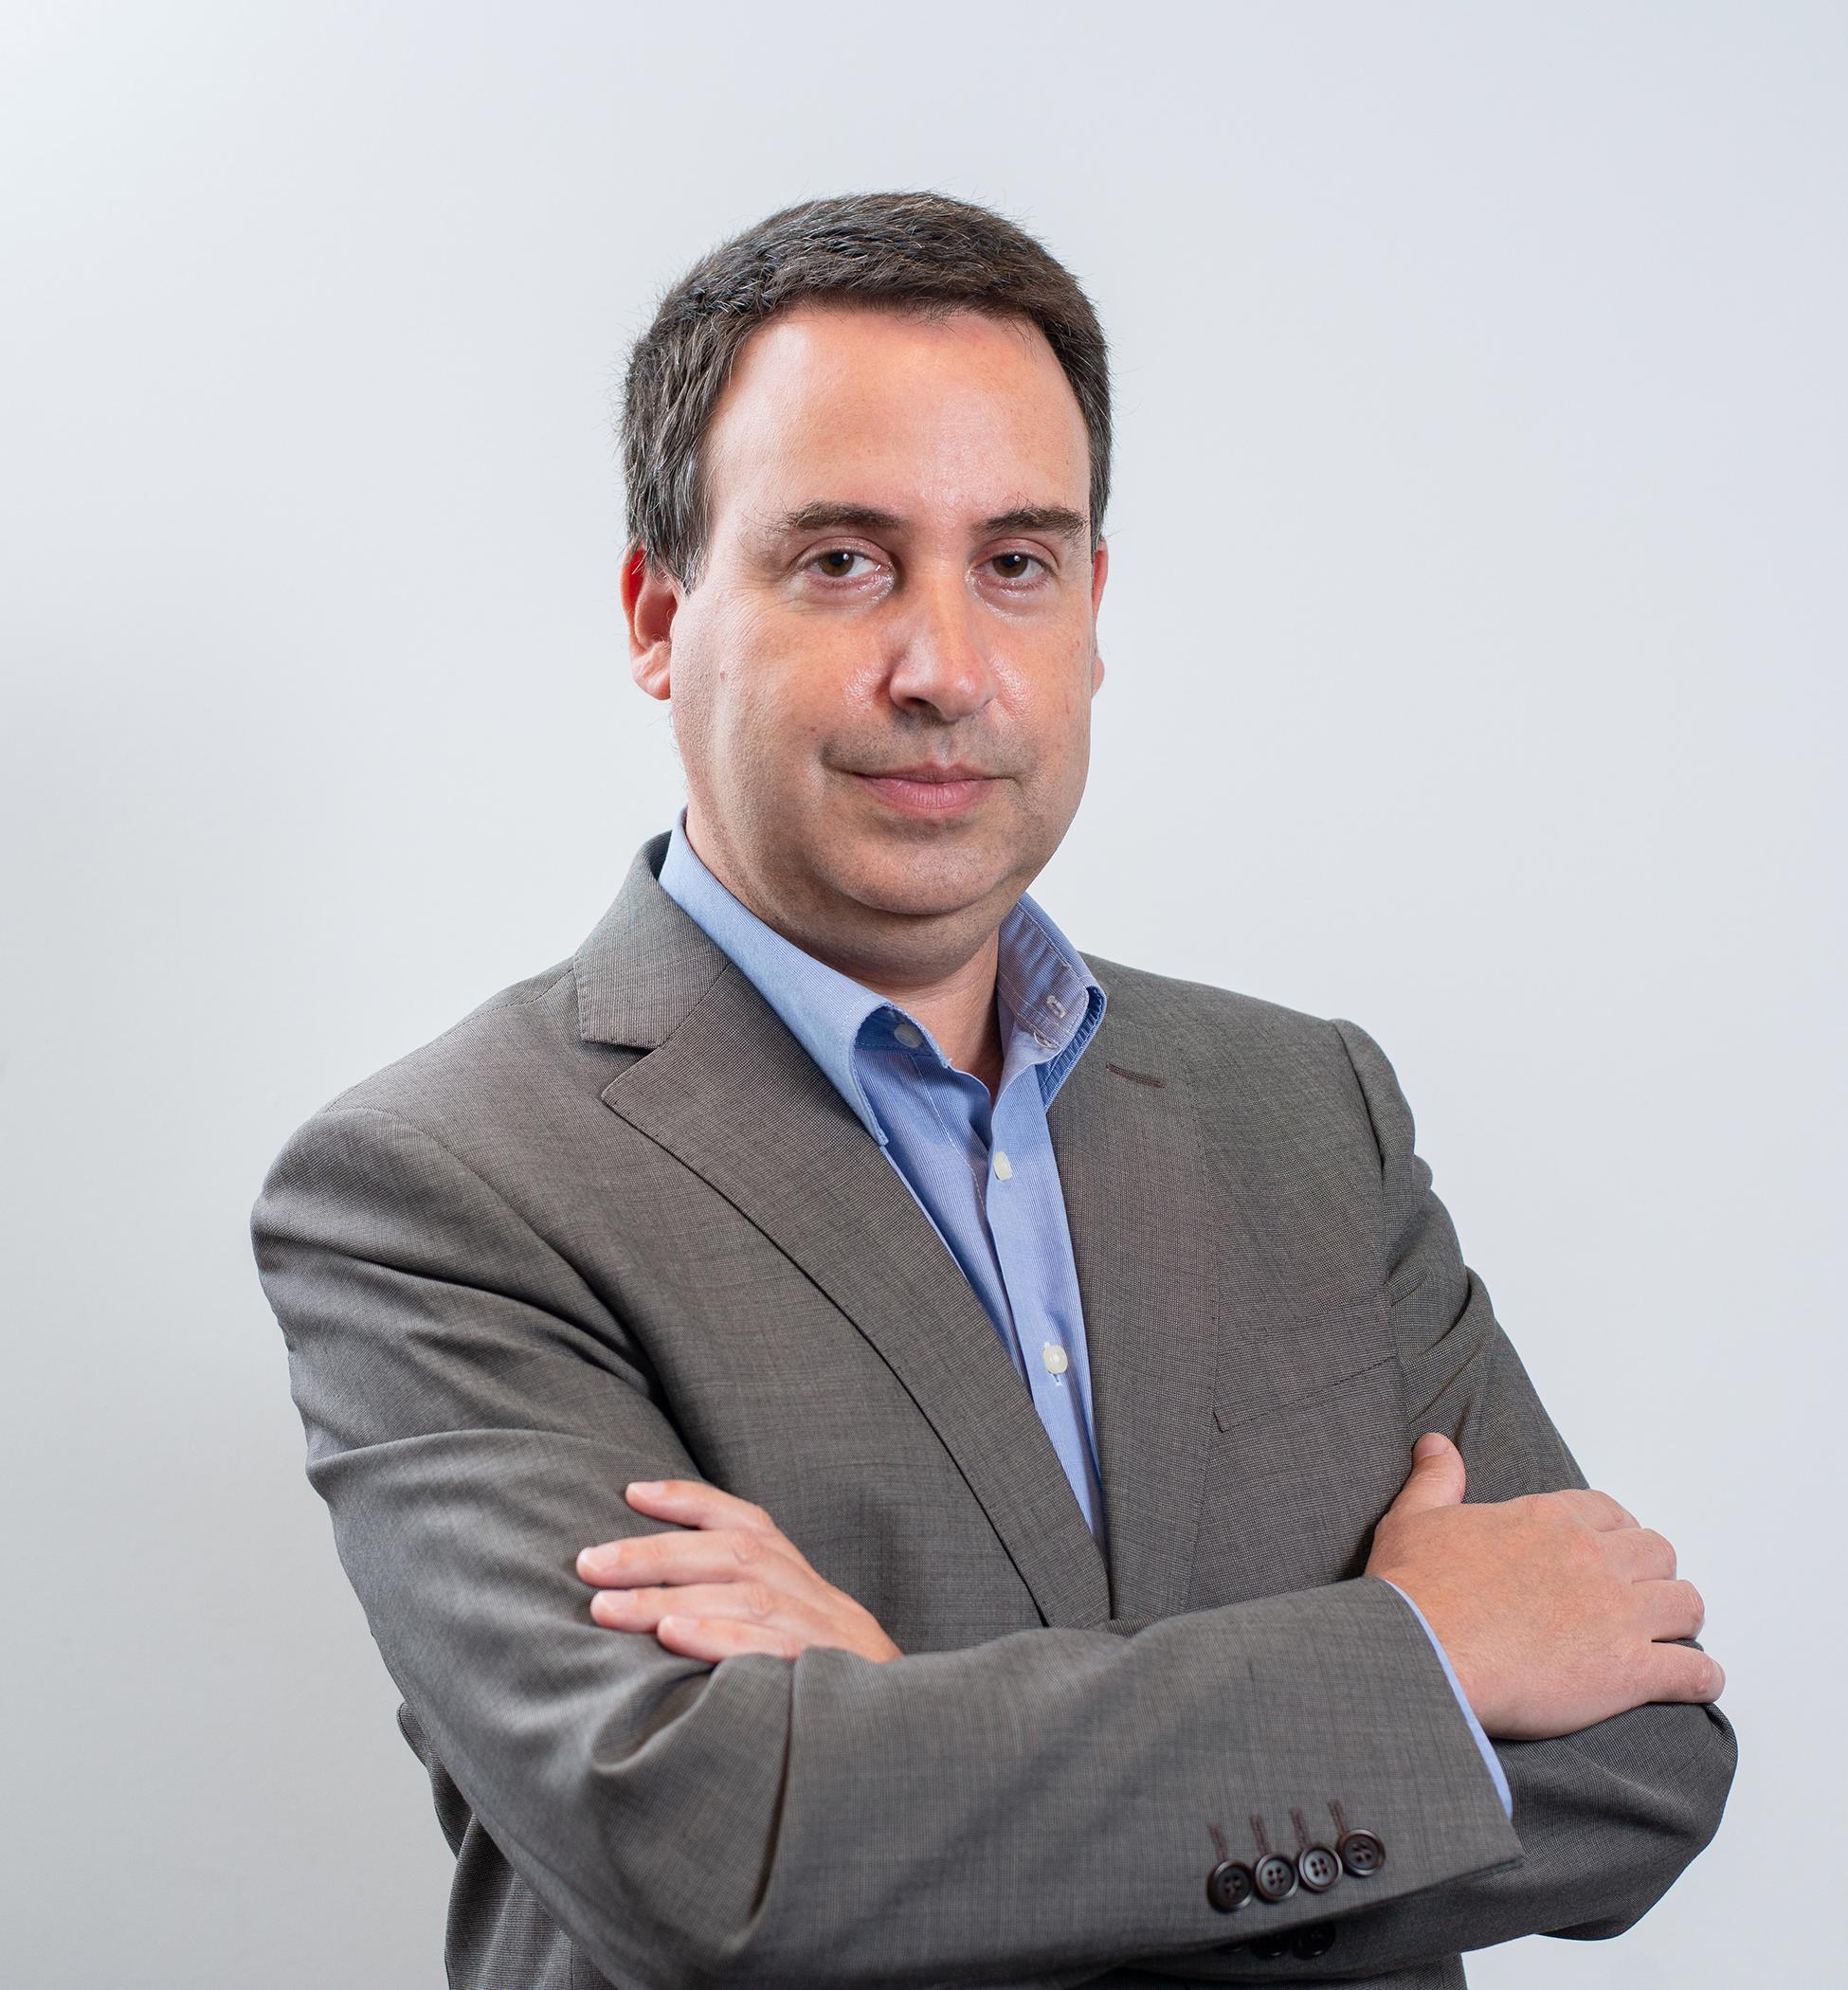 PROFESSOR DOUTOR MIGUEL VARELA